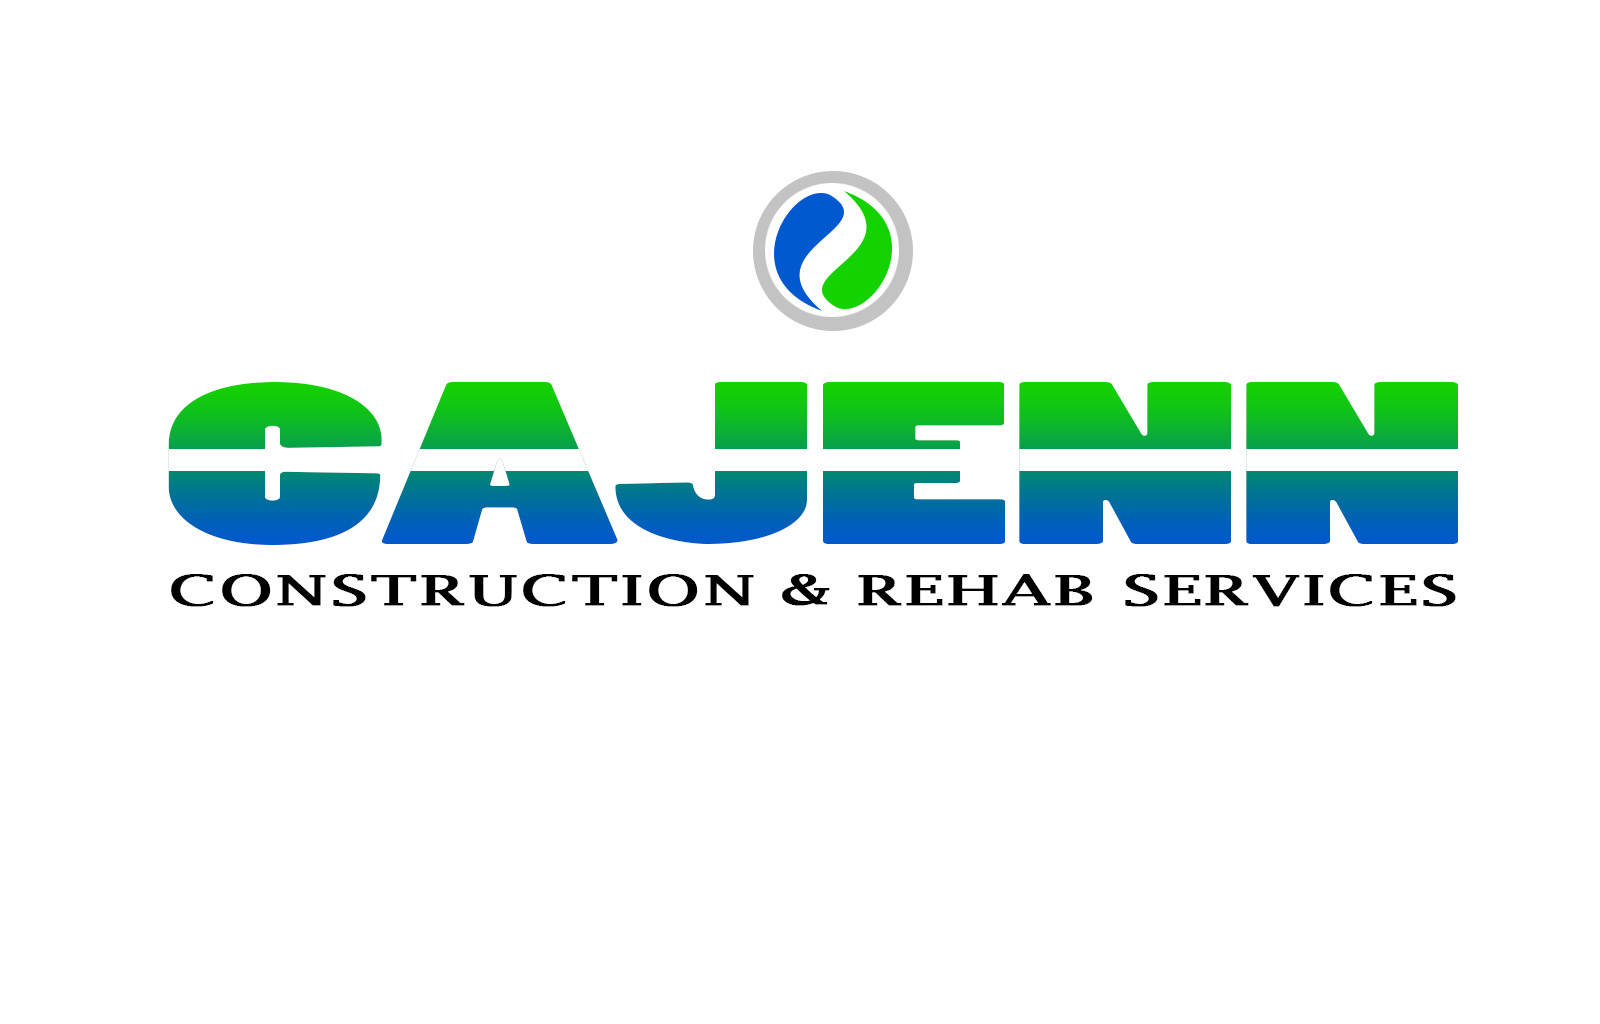 Logo Design by drunkman - Entry No. 284 in the Logo Design Contest New Logo Design for CaJenn Construction & Rehab Services.